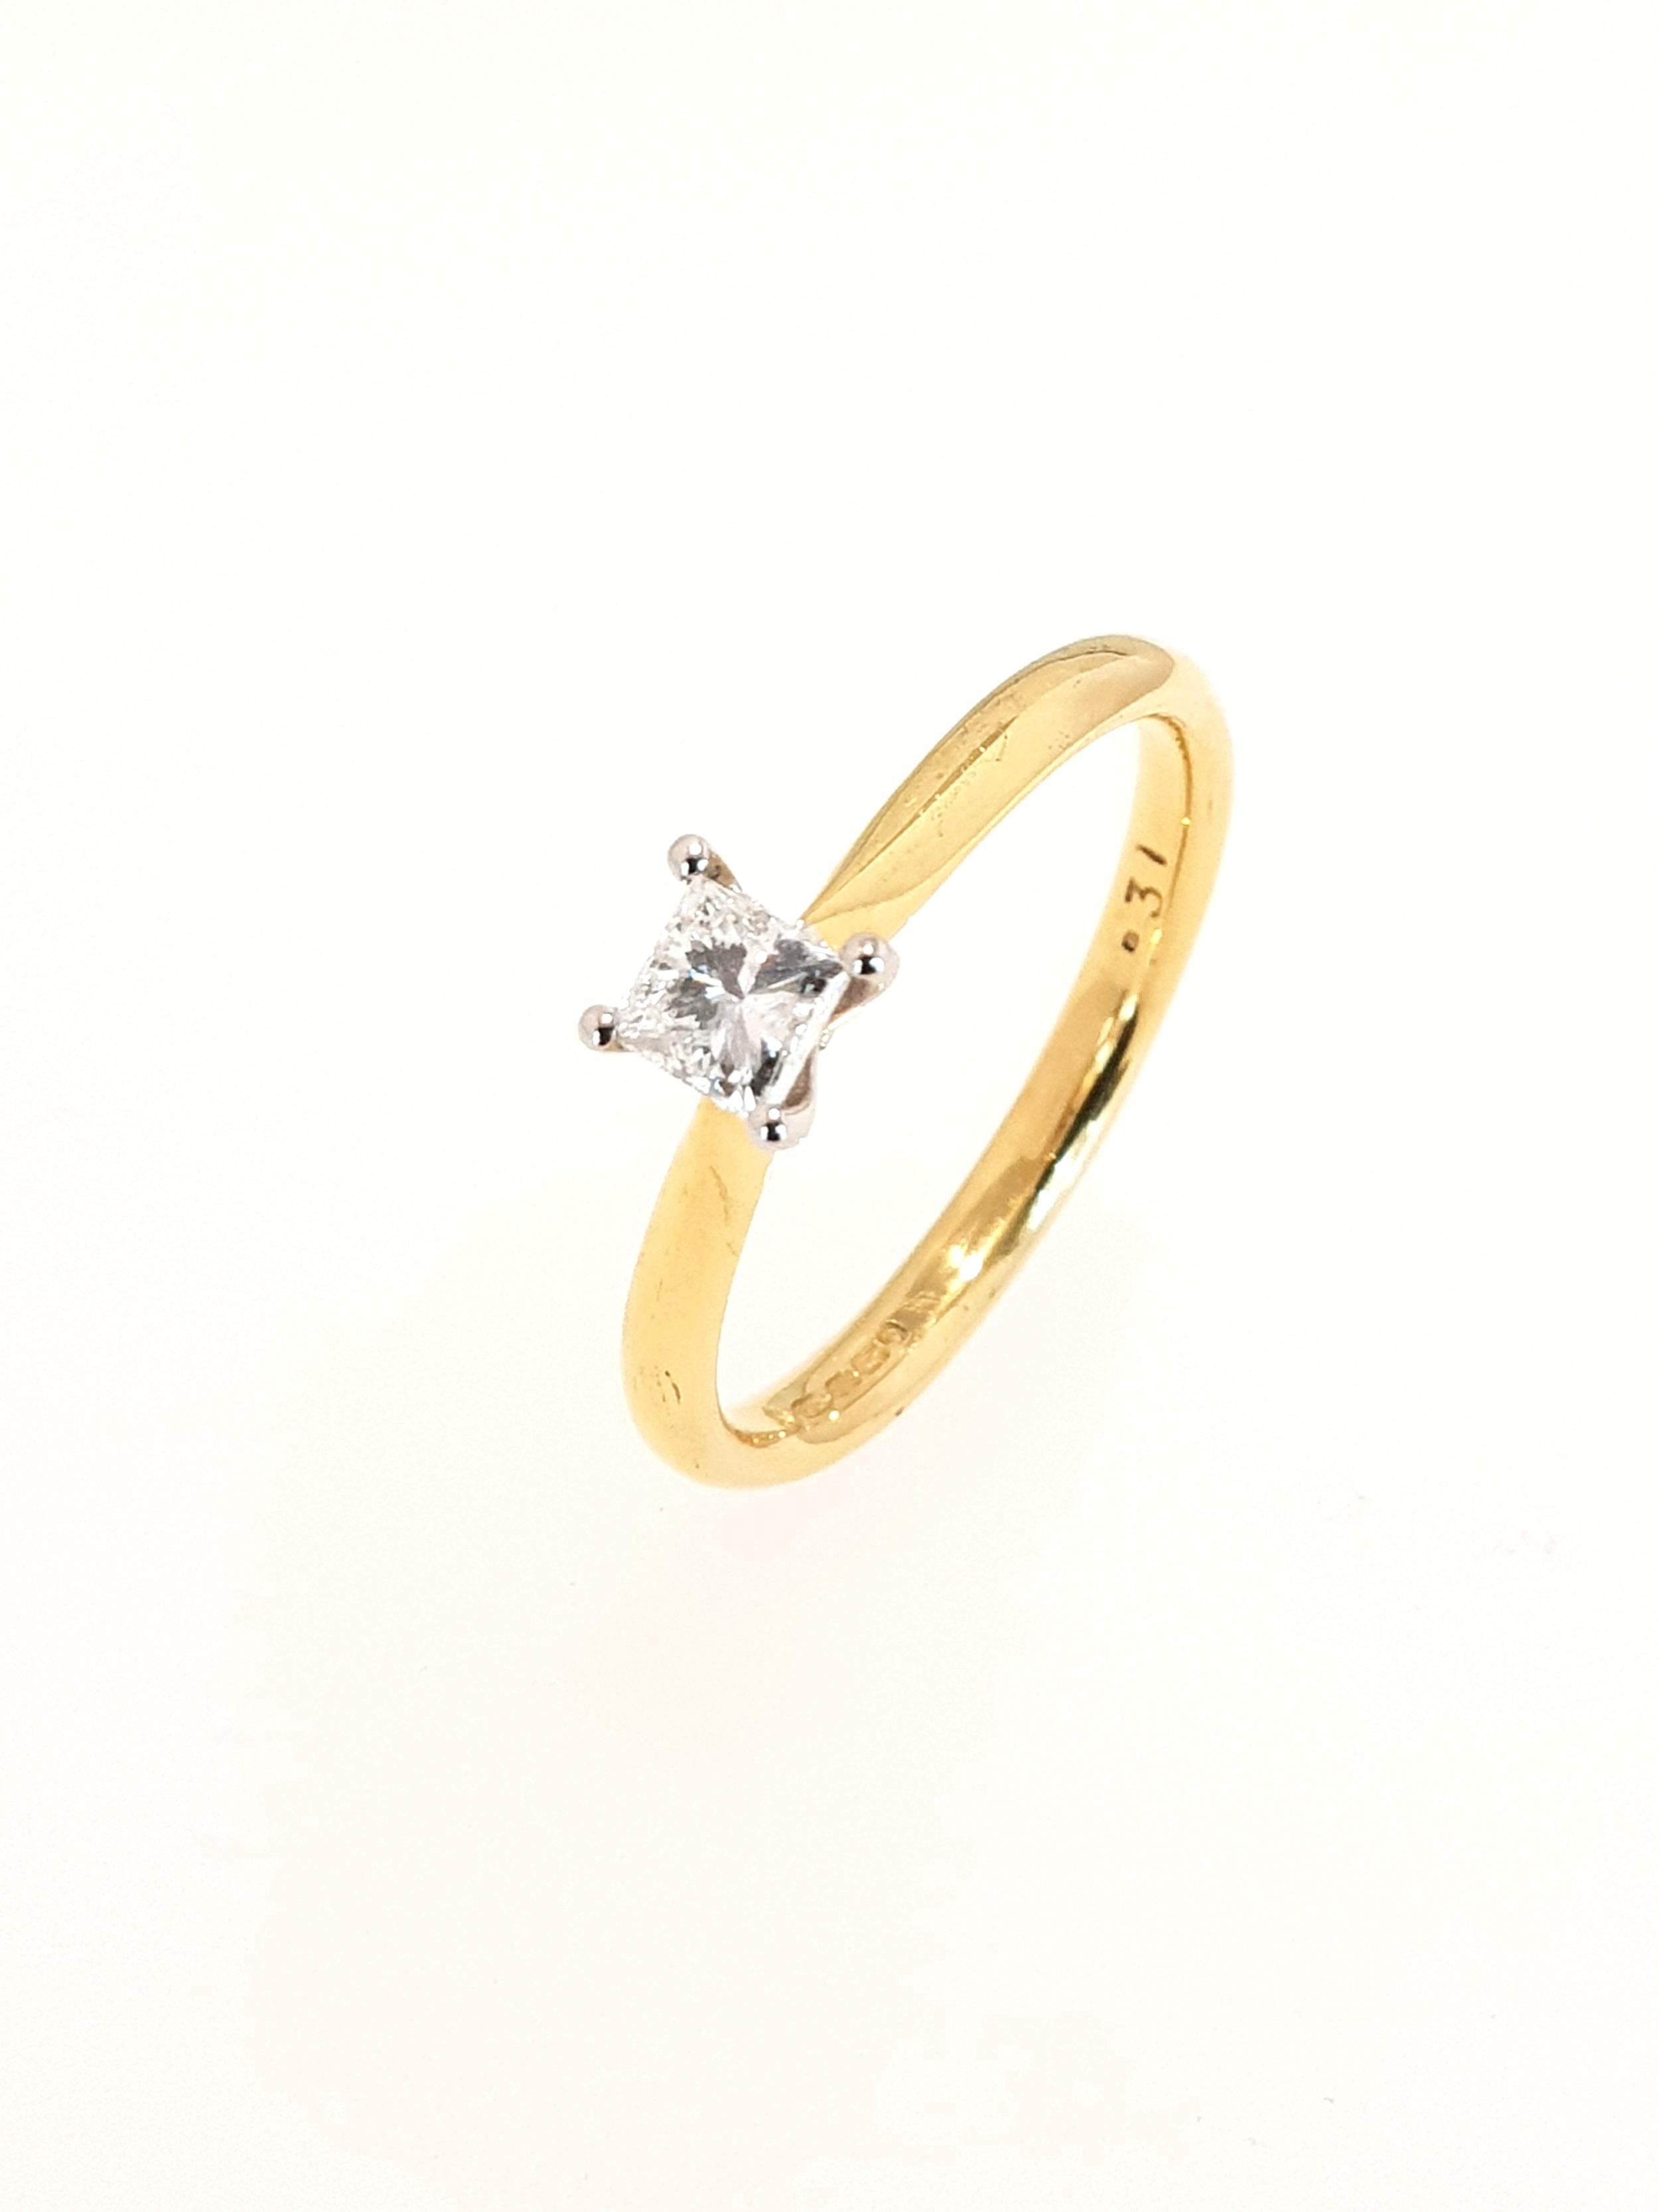 18ct Yellow Gold Diamond Ring, Princess Cut  .30ct, G, Si1  Stock Code: N8326  £1150